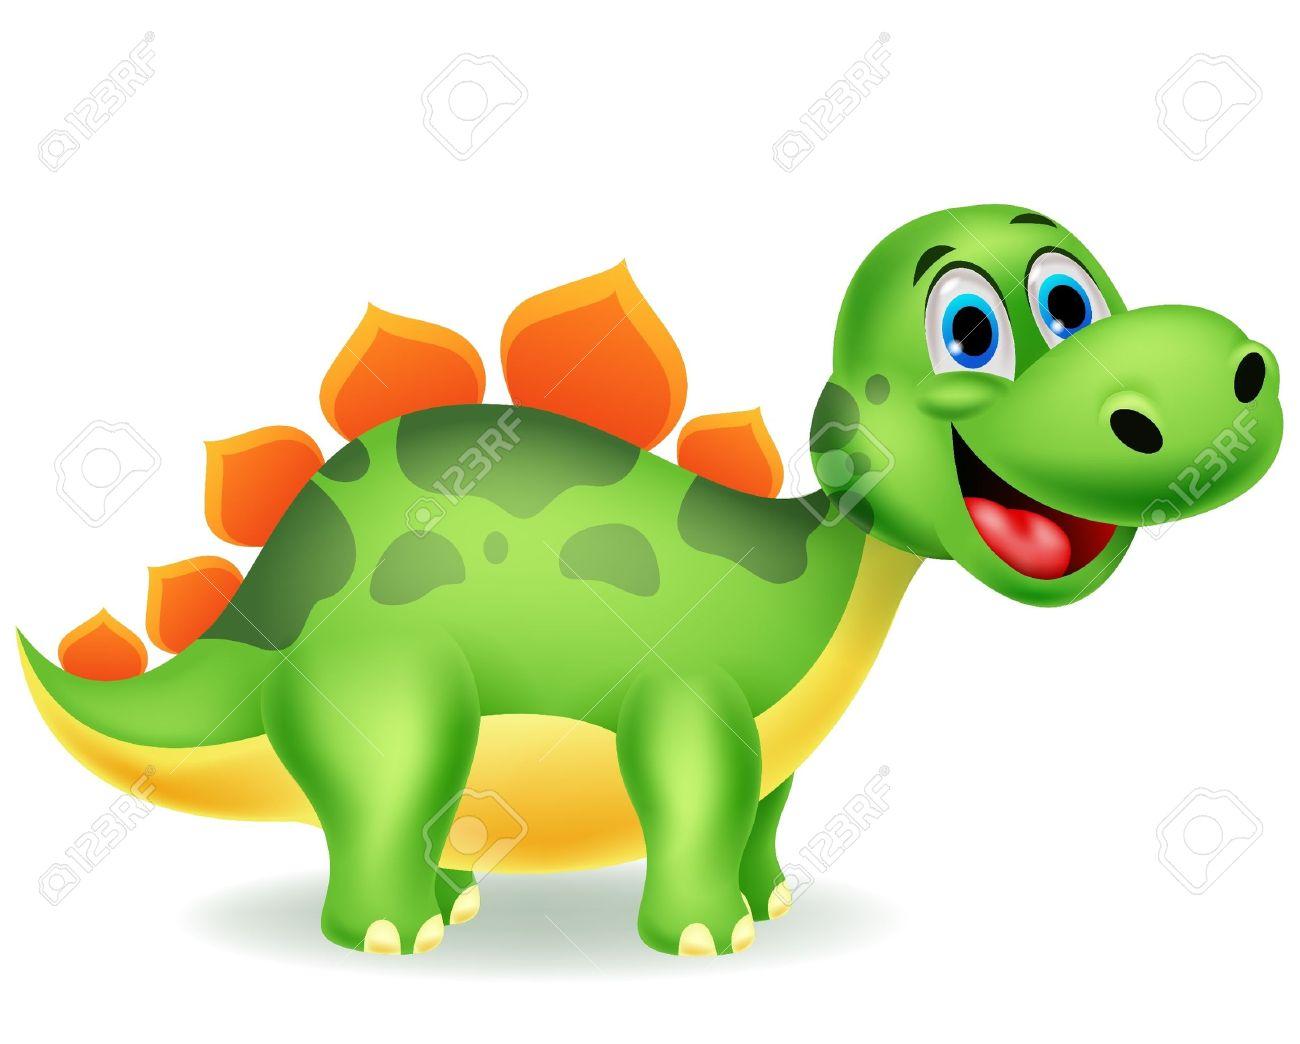 Cute Dinosaur Cartoon Royalty Free Cliparts Vectors And Stock Illustration Image 19864912